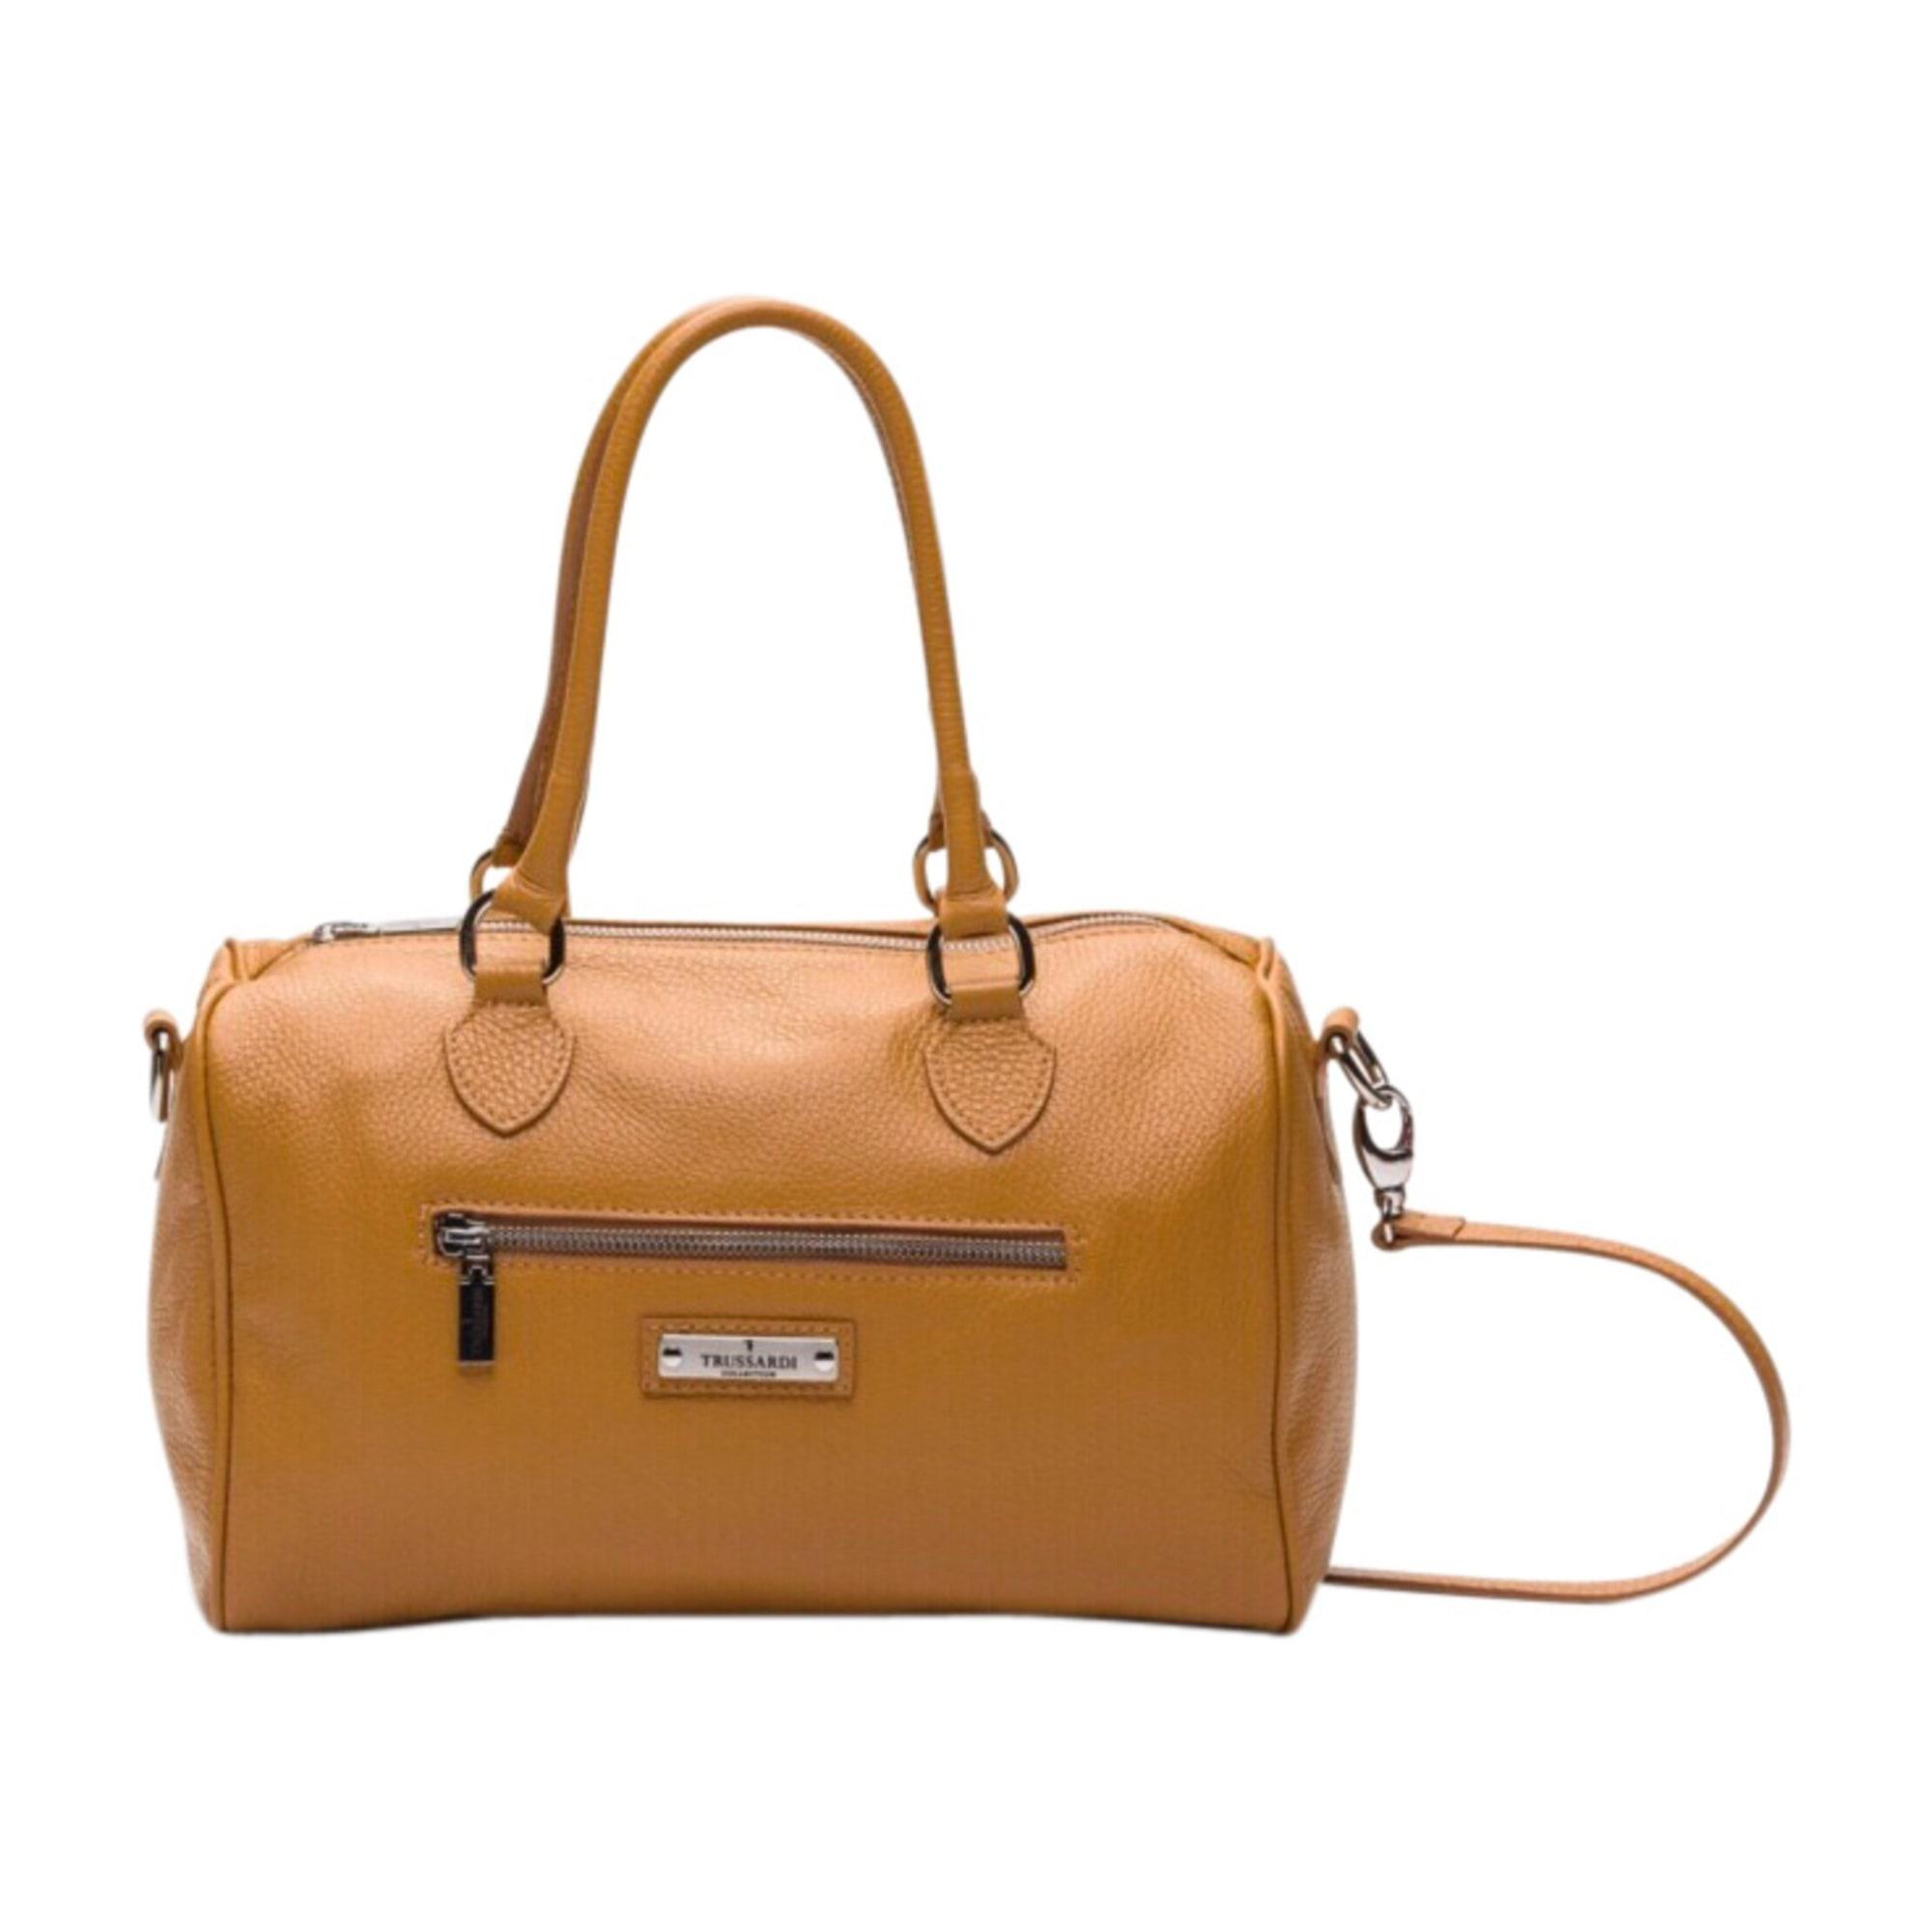 026f12a312 Sac en bandoulière en cuir TRUSSARDI beige - 7282782